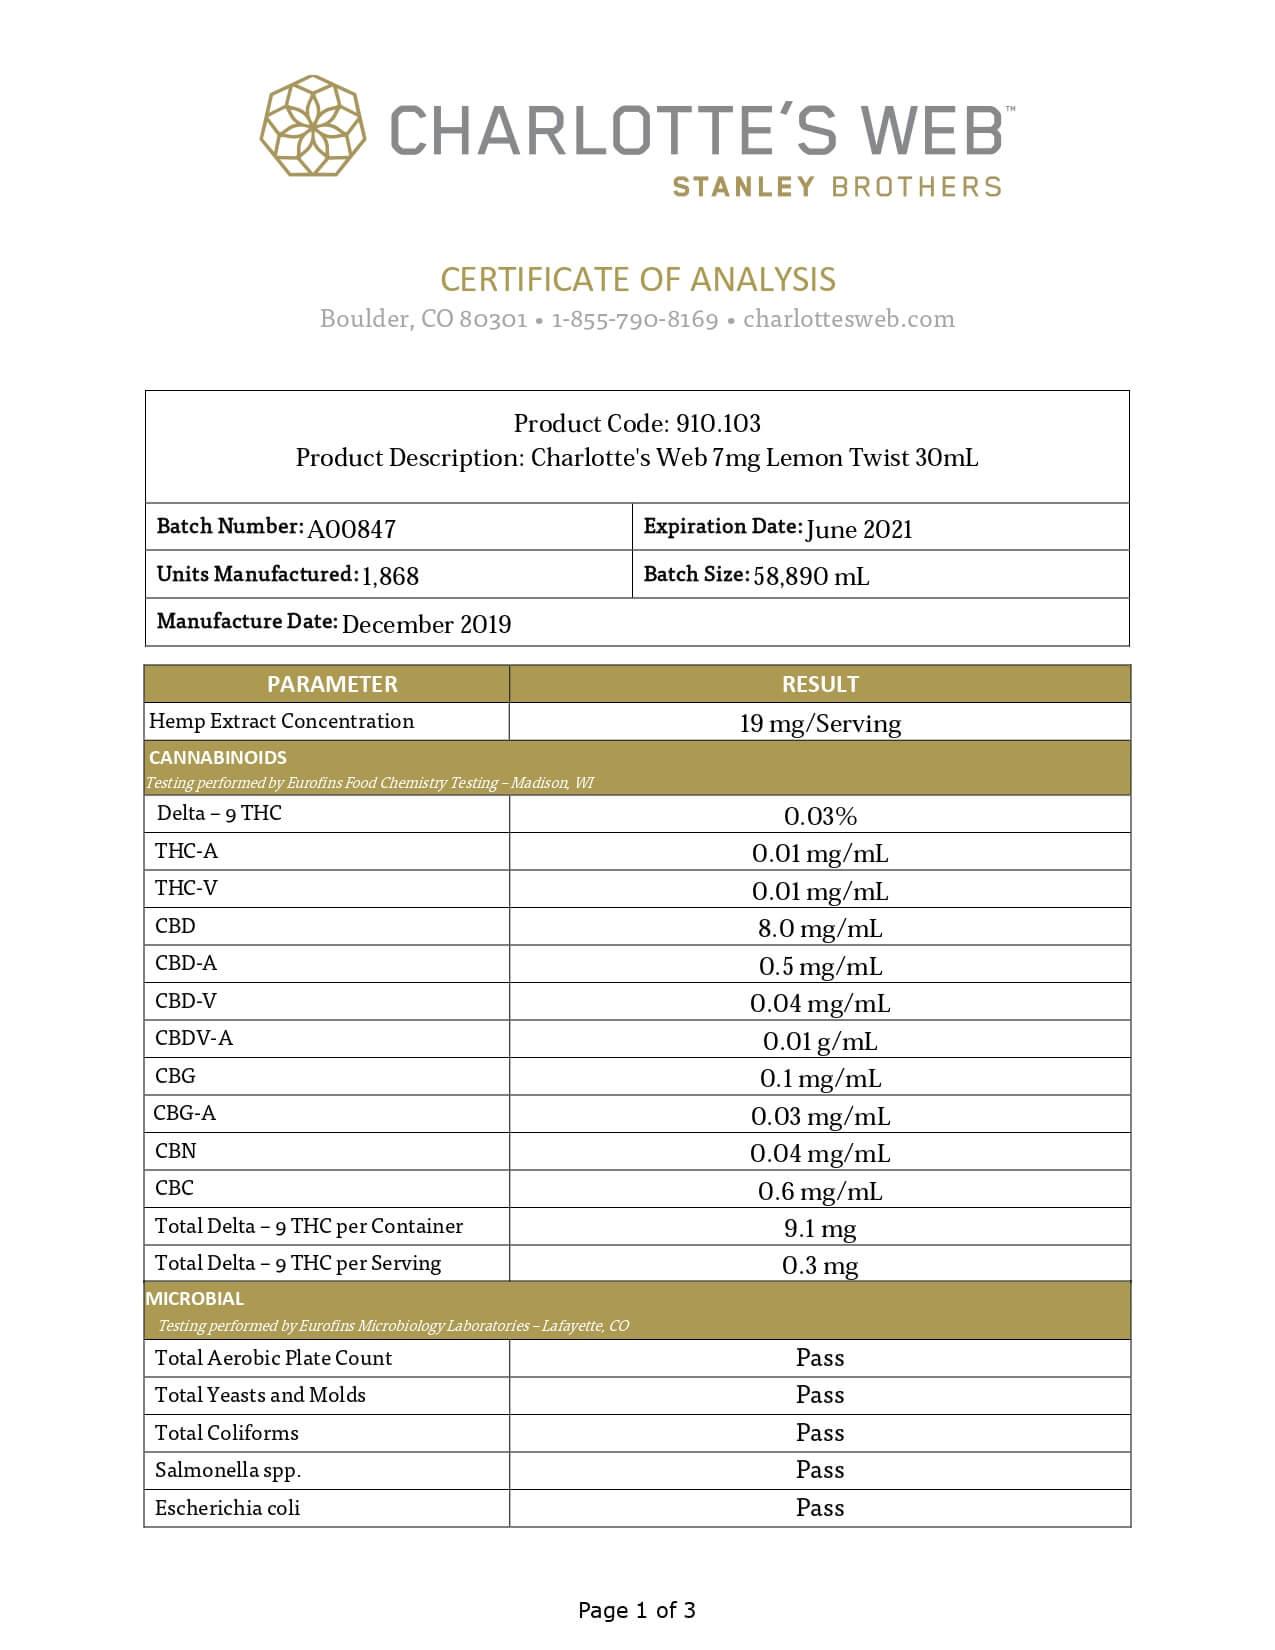 Charlottes Web CBD Tincture Full Spectrum Lemon Twist 7mg 1ml Lab Report